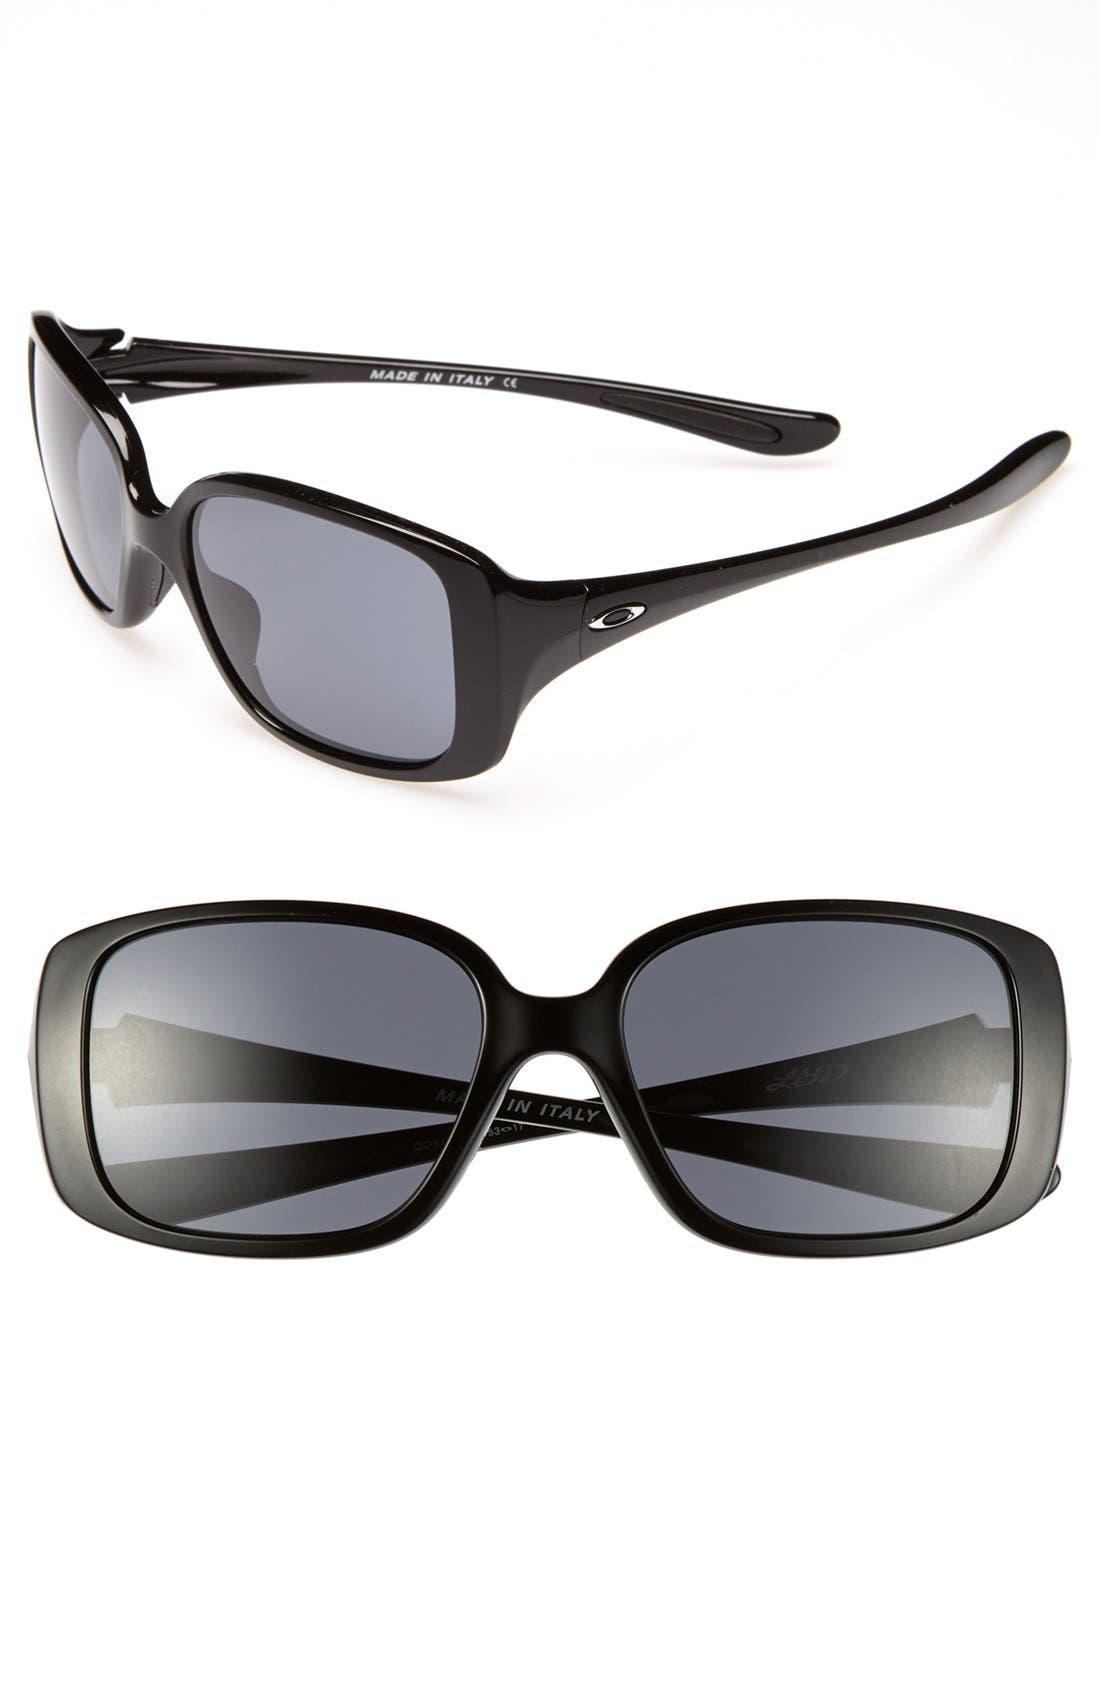 Main Image - Oakley 'LBD' 53mm Sunglasses